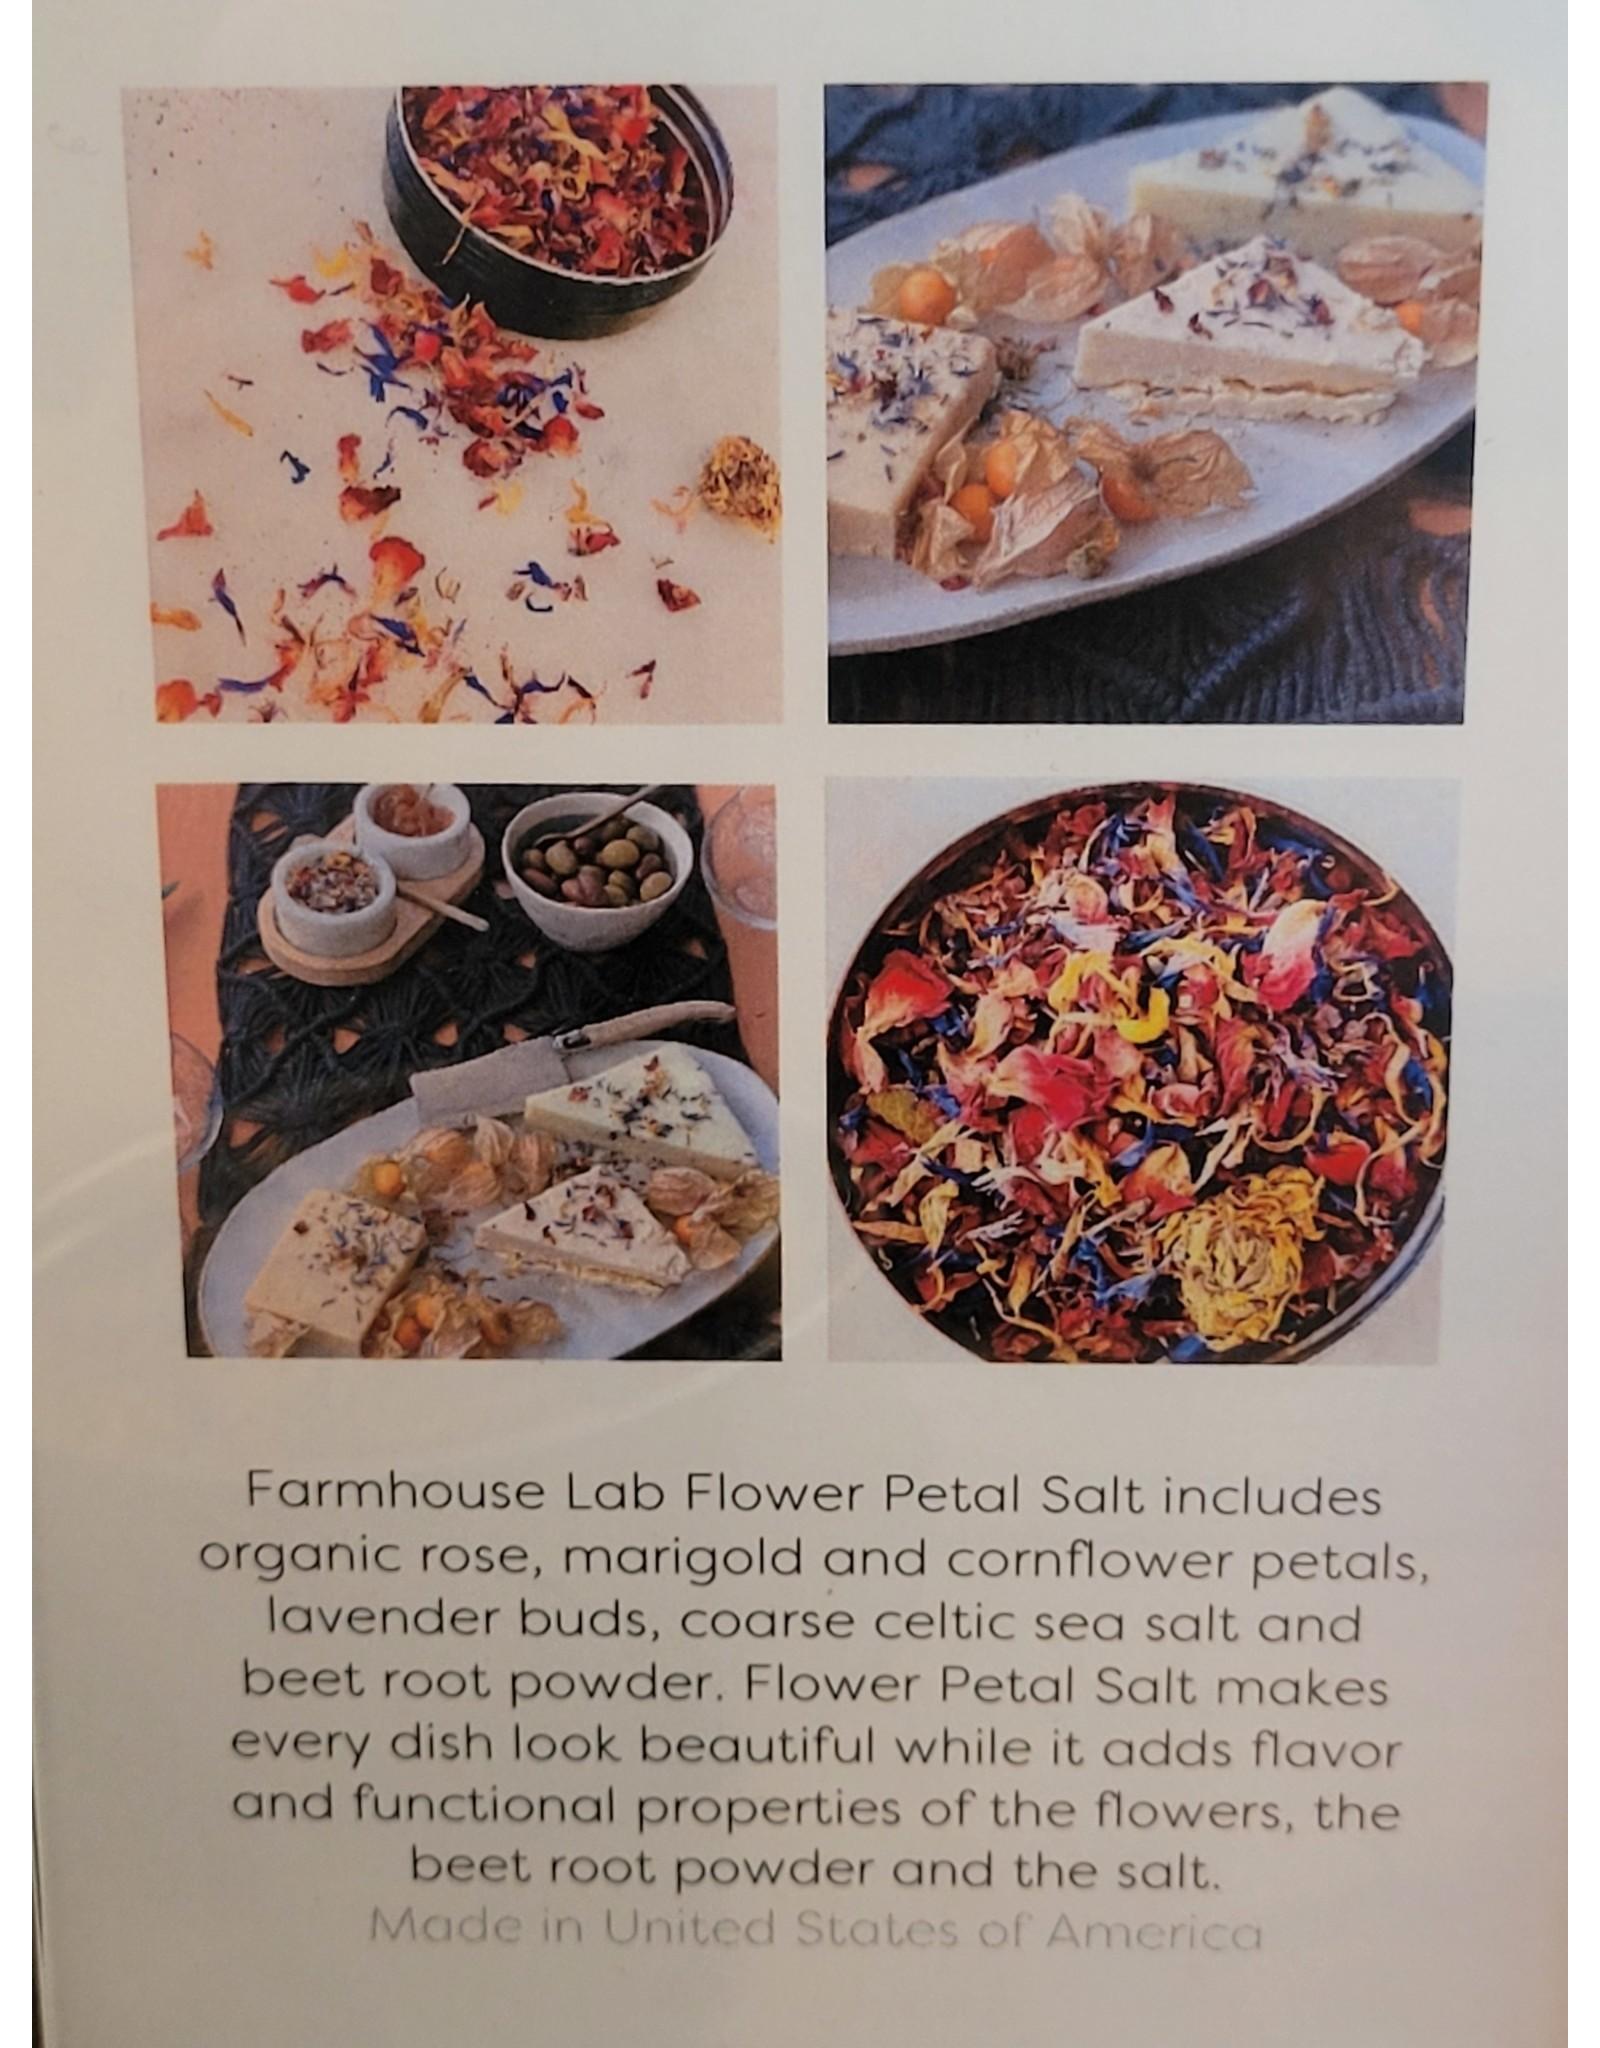 Farmhouse Lab Flower Petal Salt